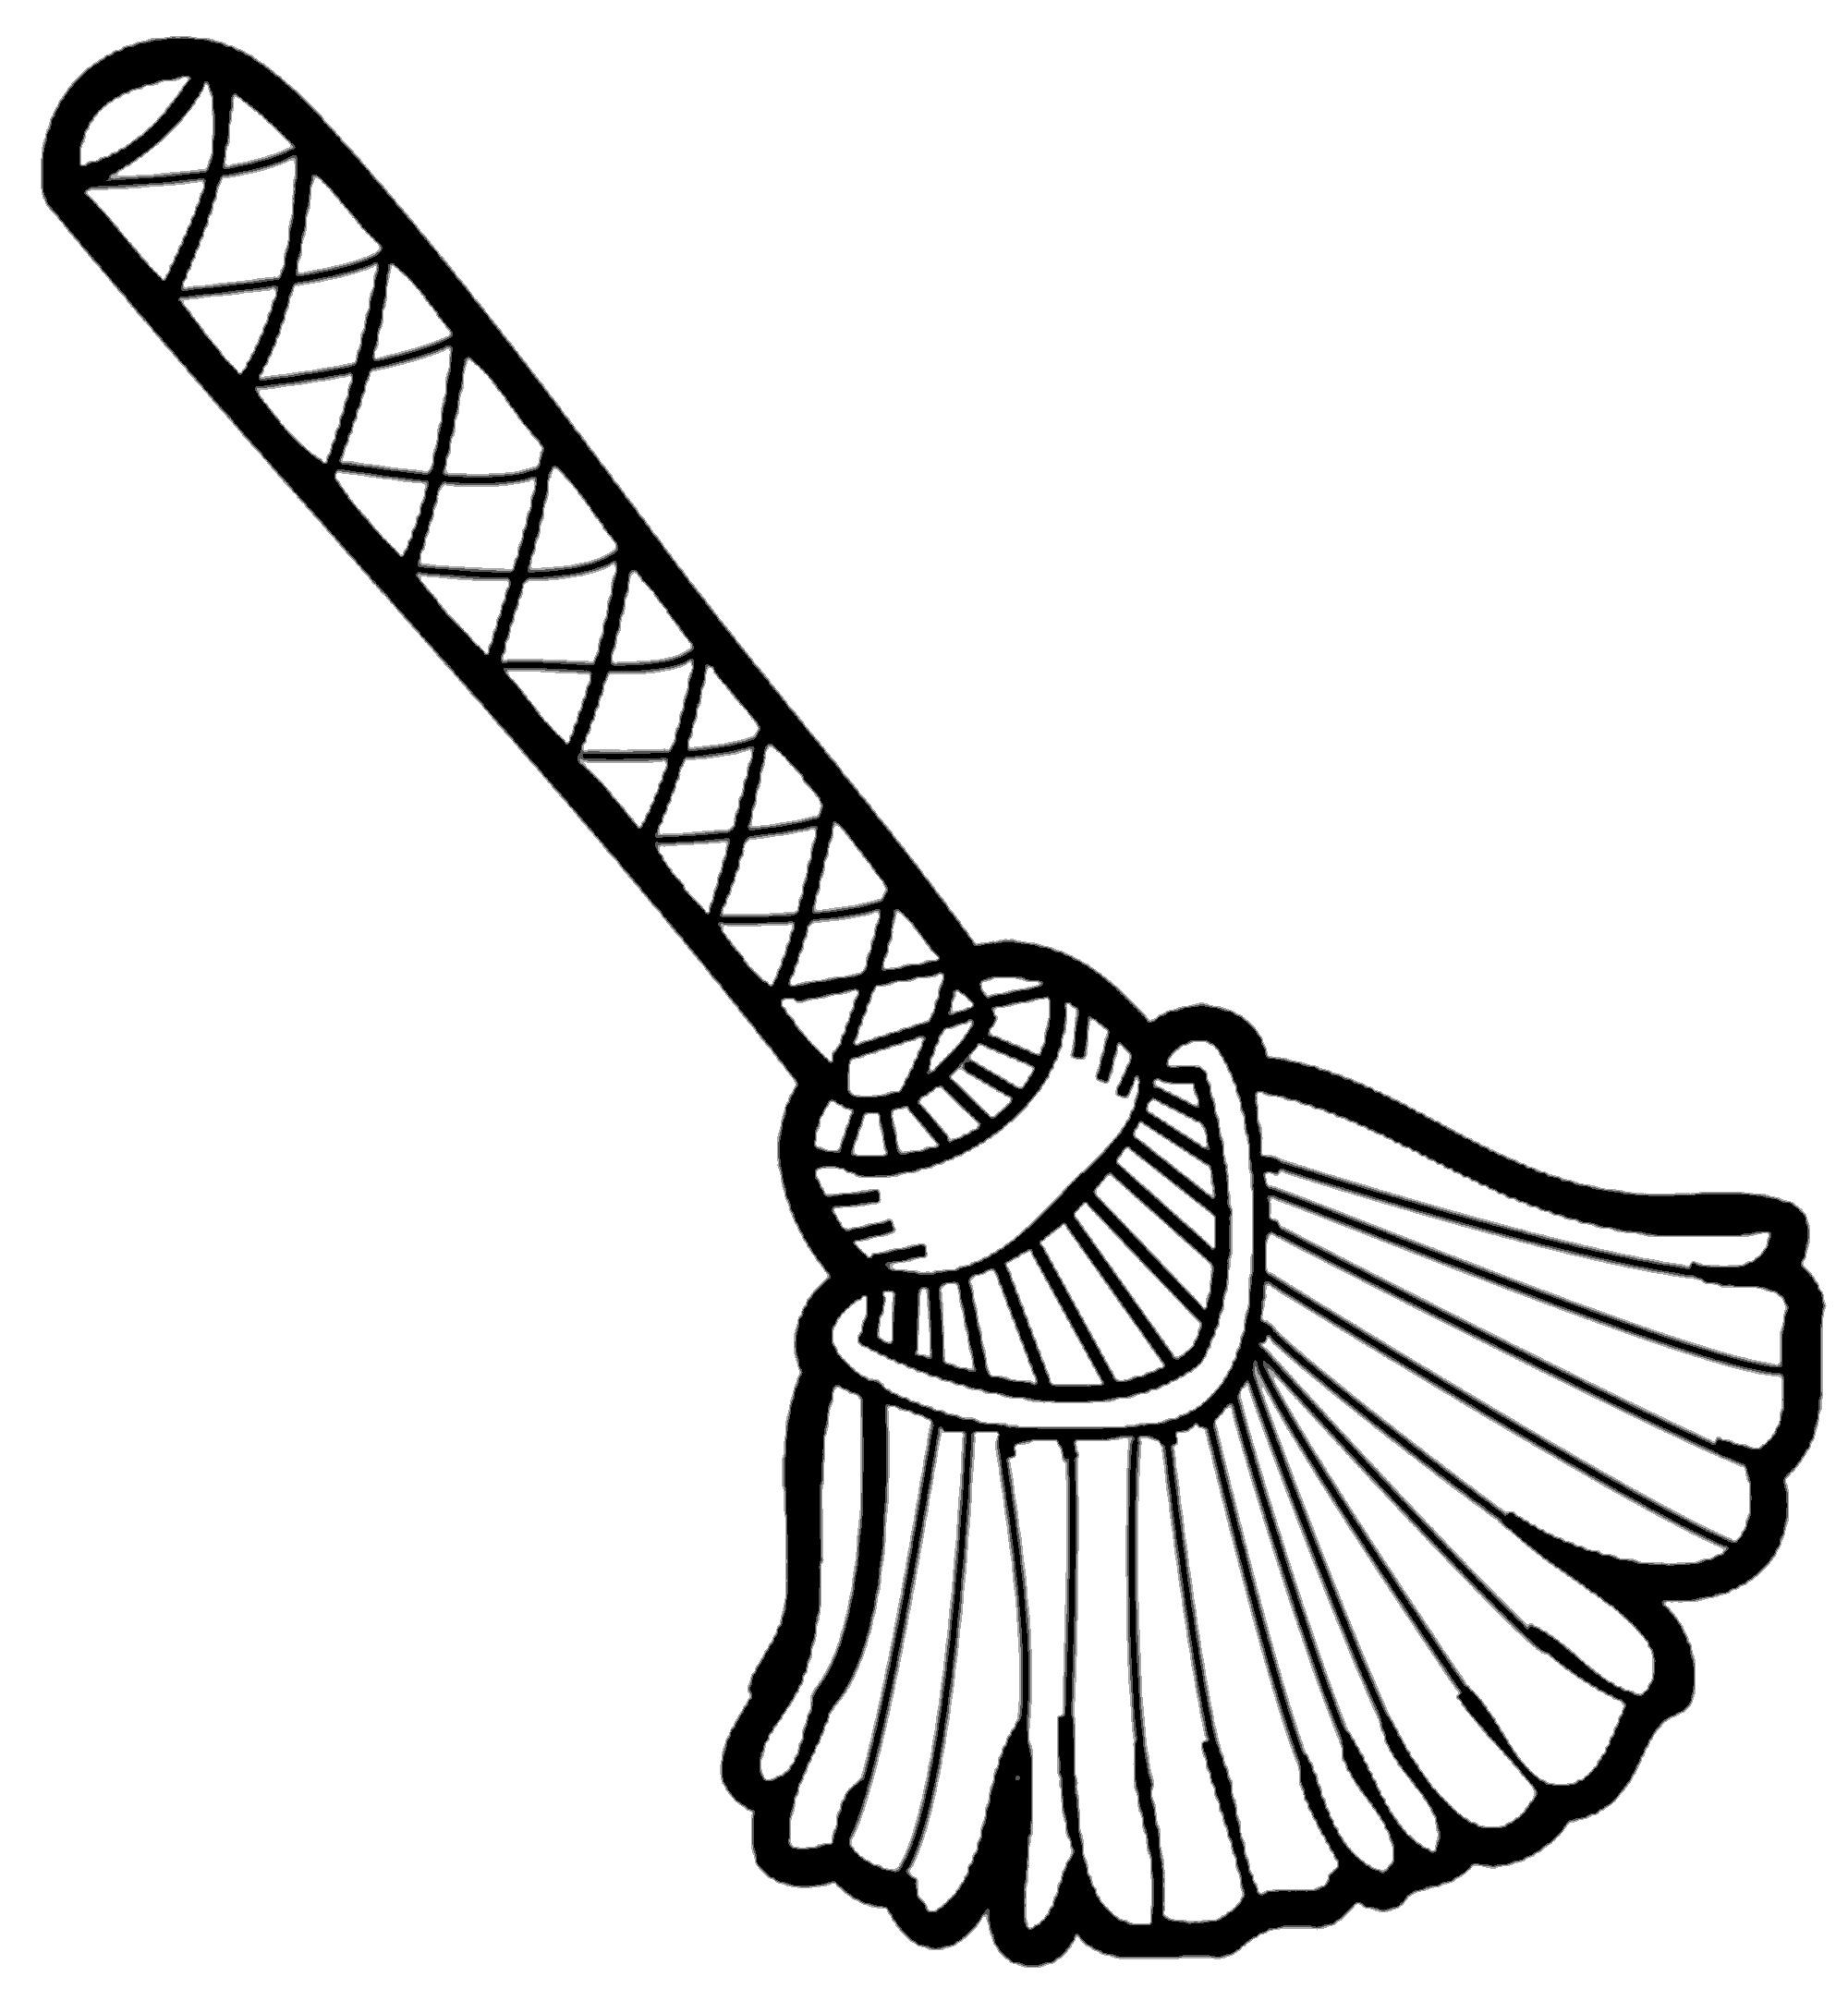 Free Broom Cliparts, Download Free Clip Art, Free Clip Art.